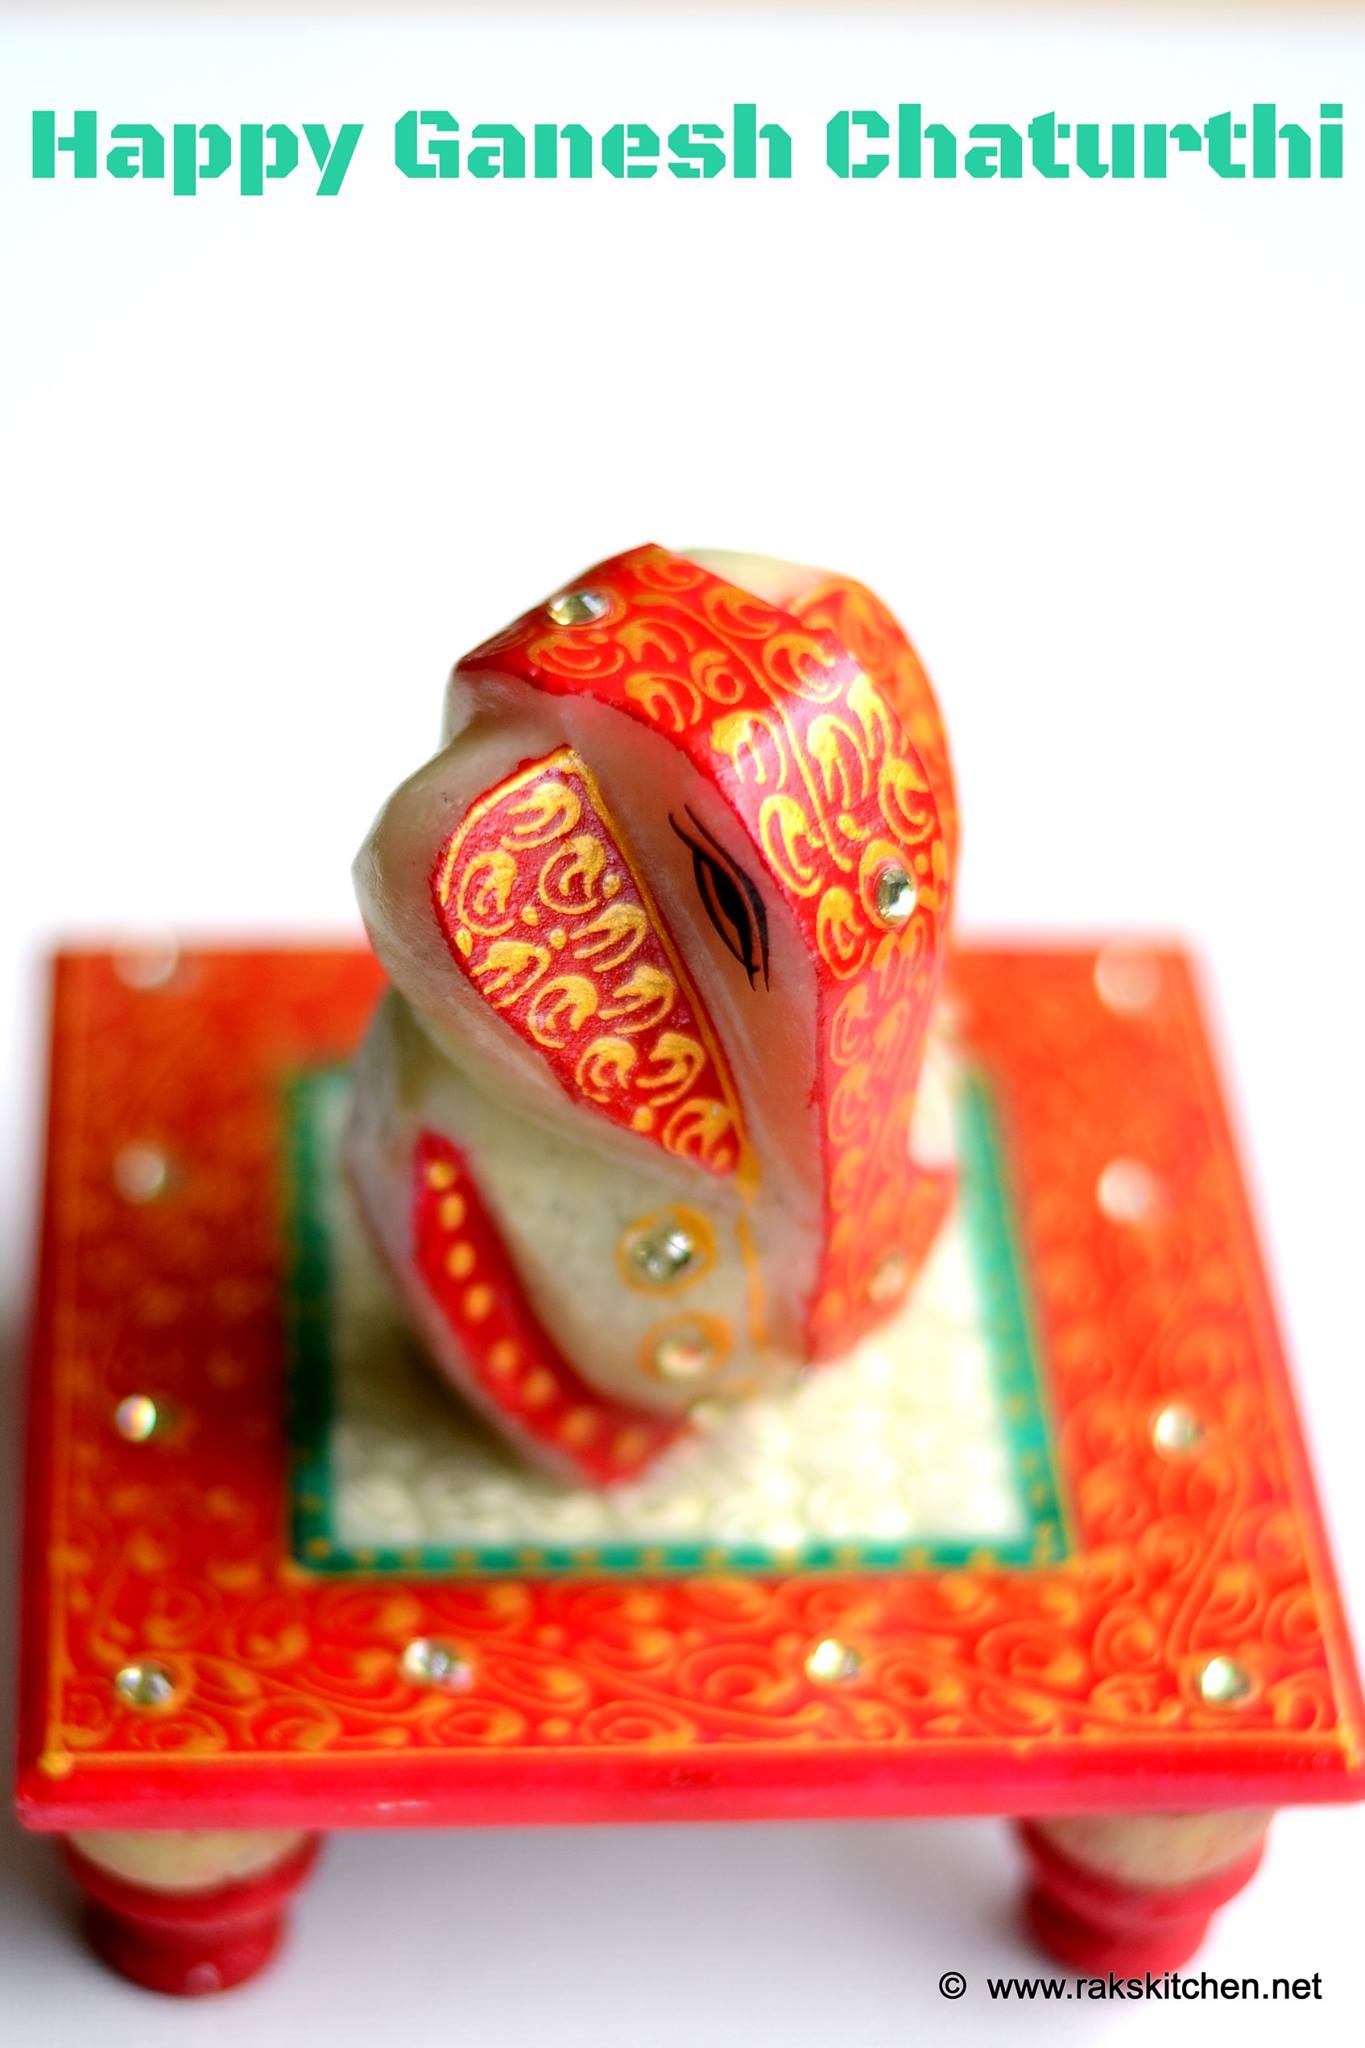 Ganesh chaturthi wishes, ganesh chaturthi recipes